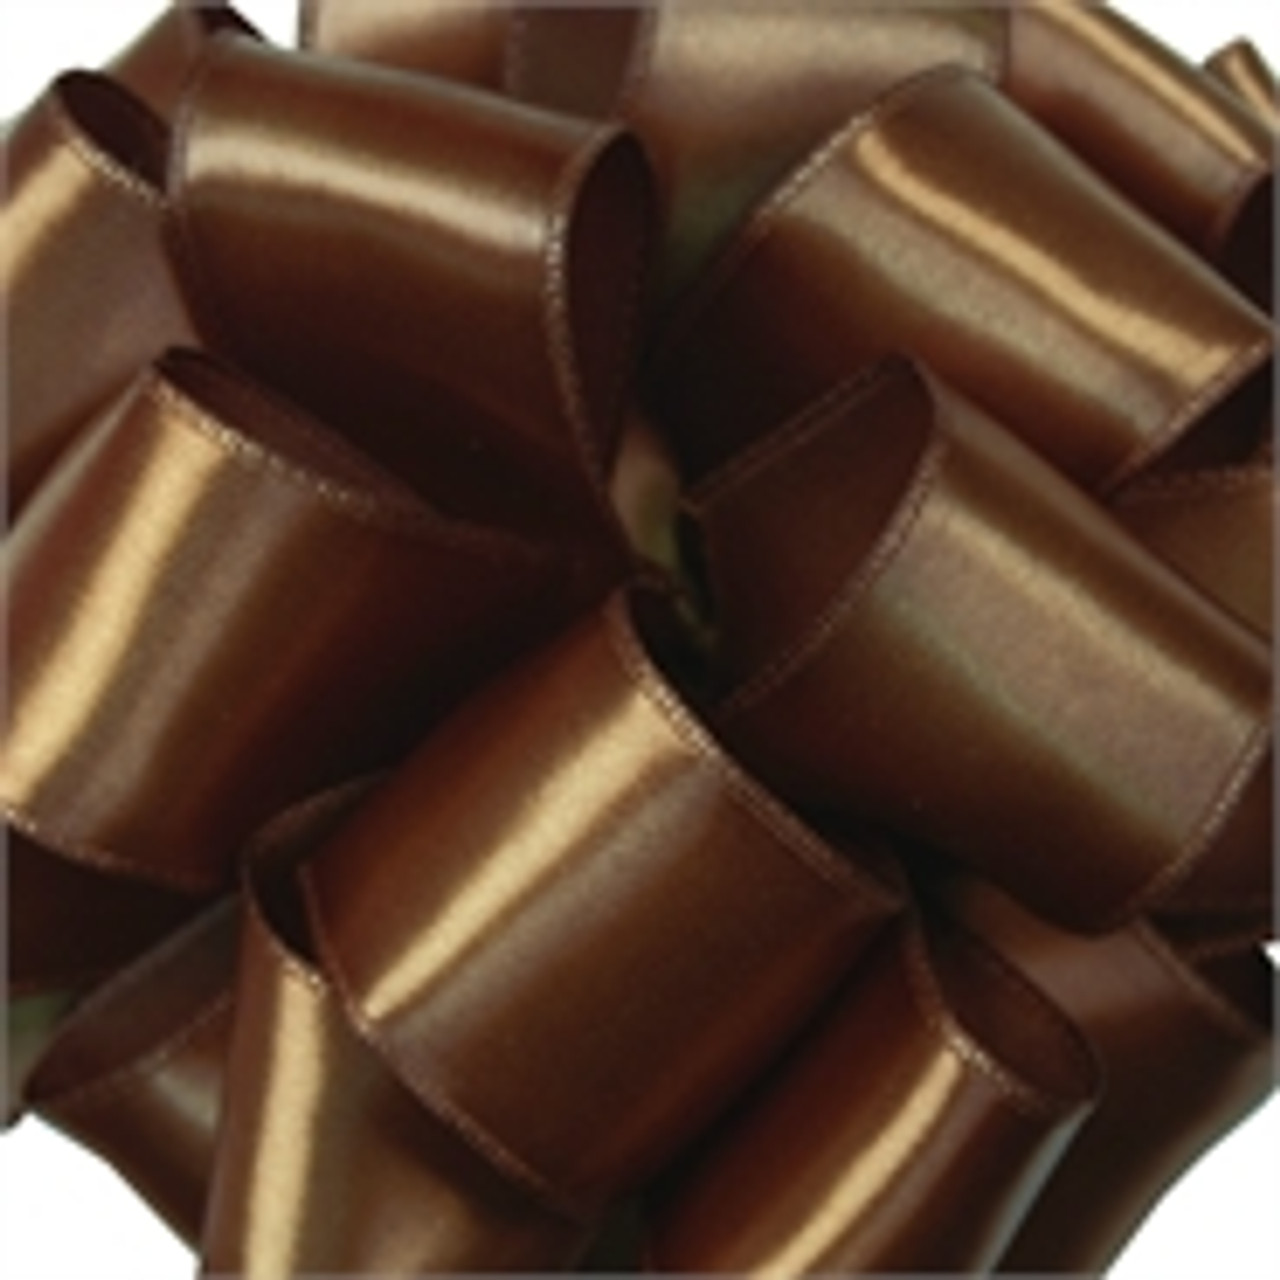 Chocolate Wired Satin Ribbon